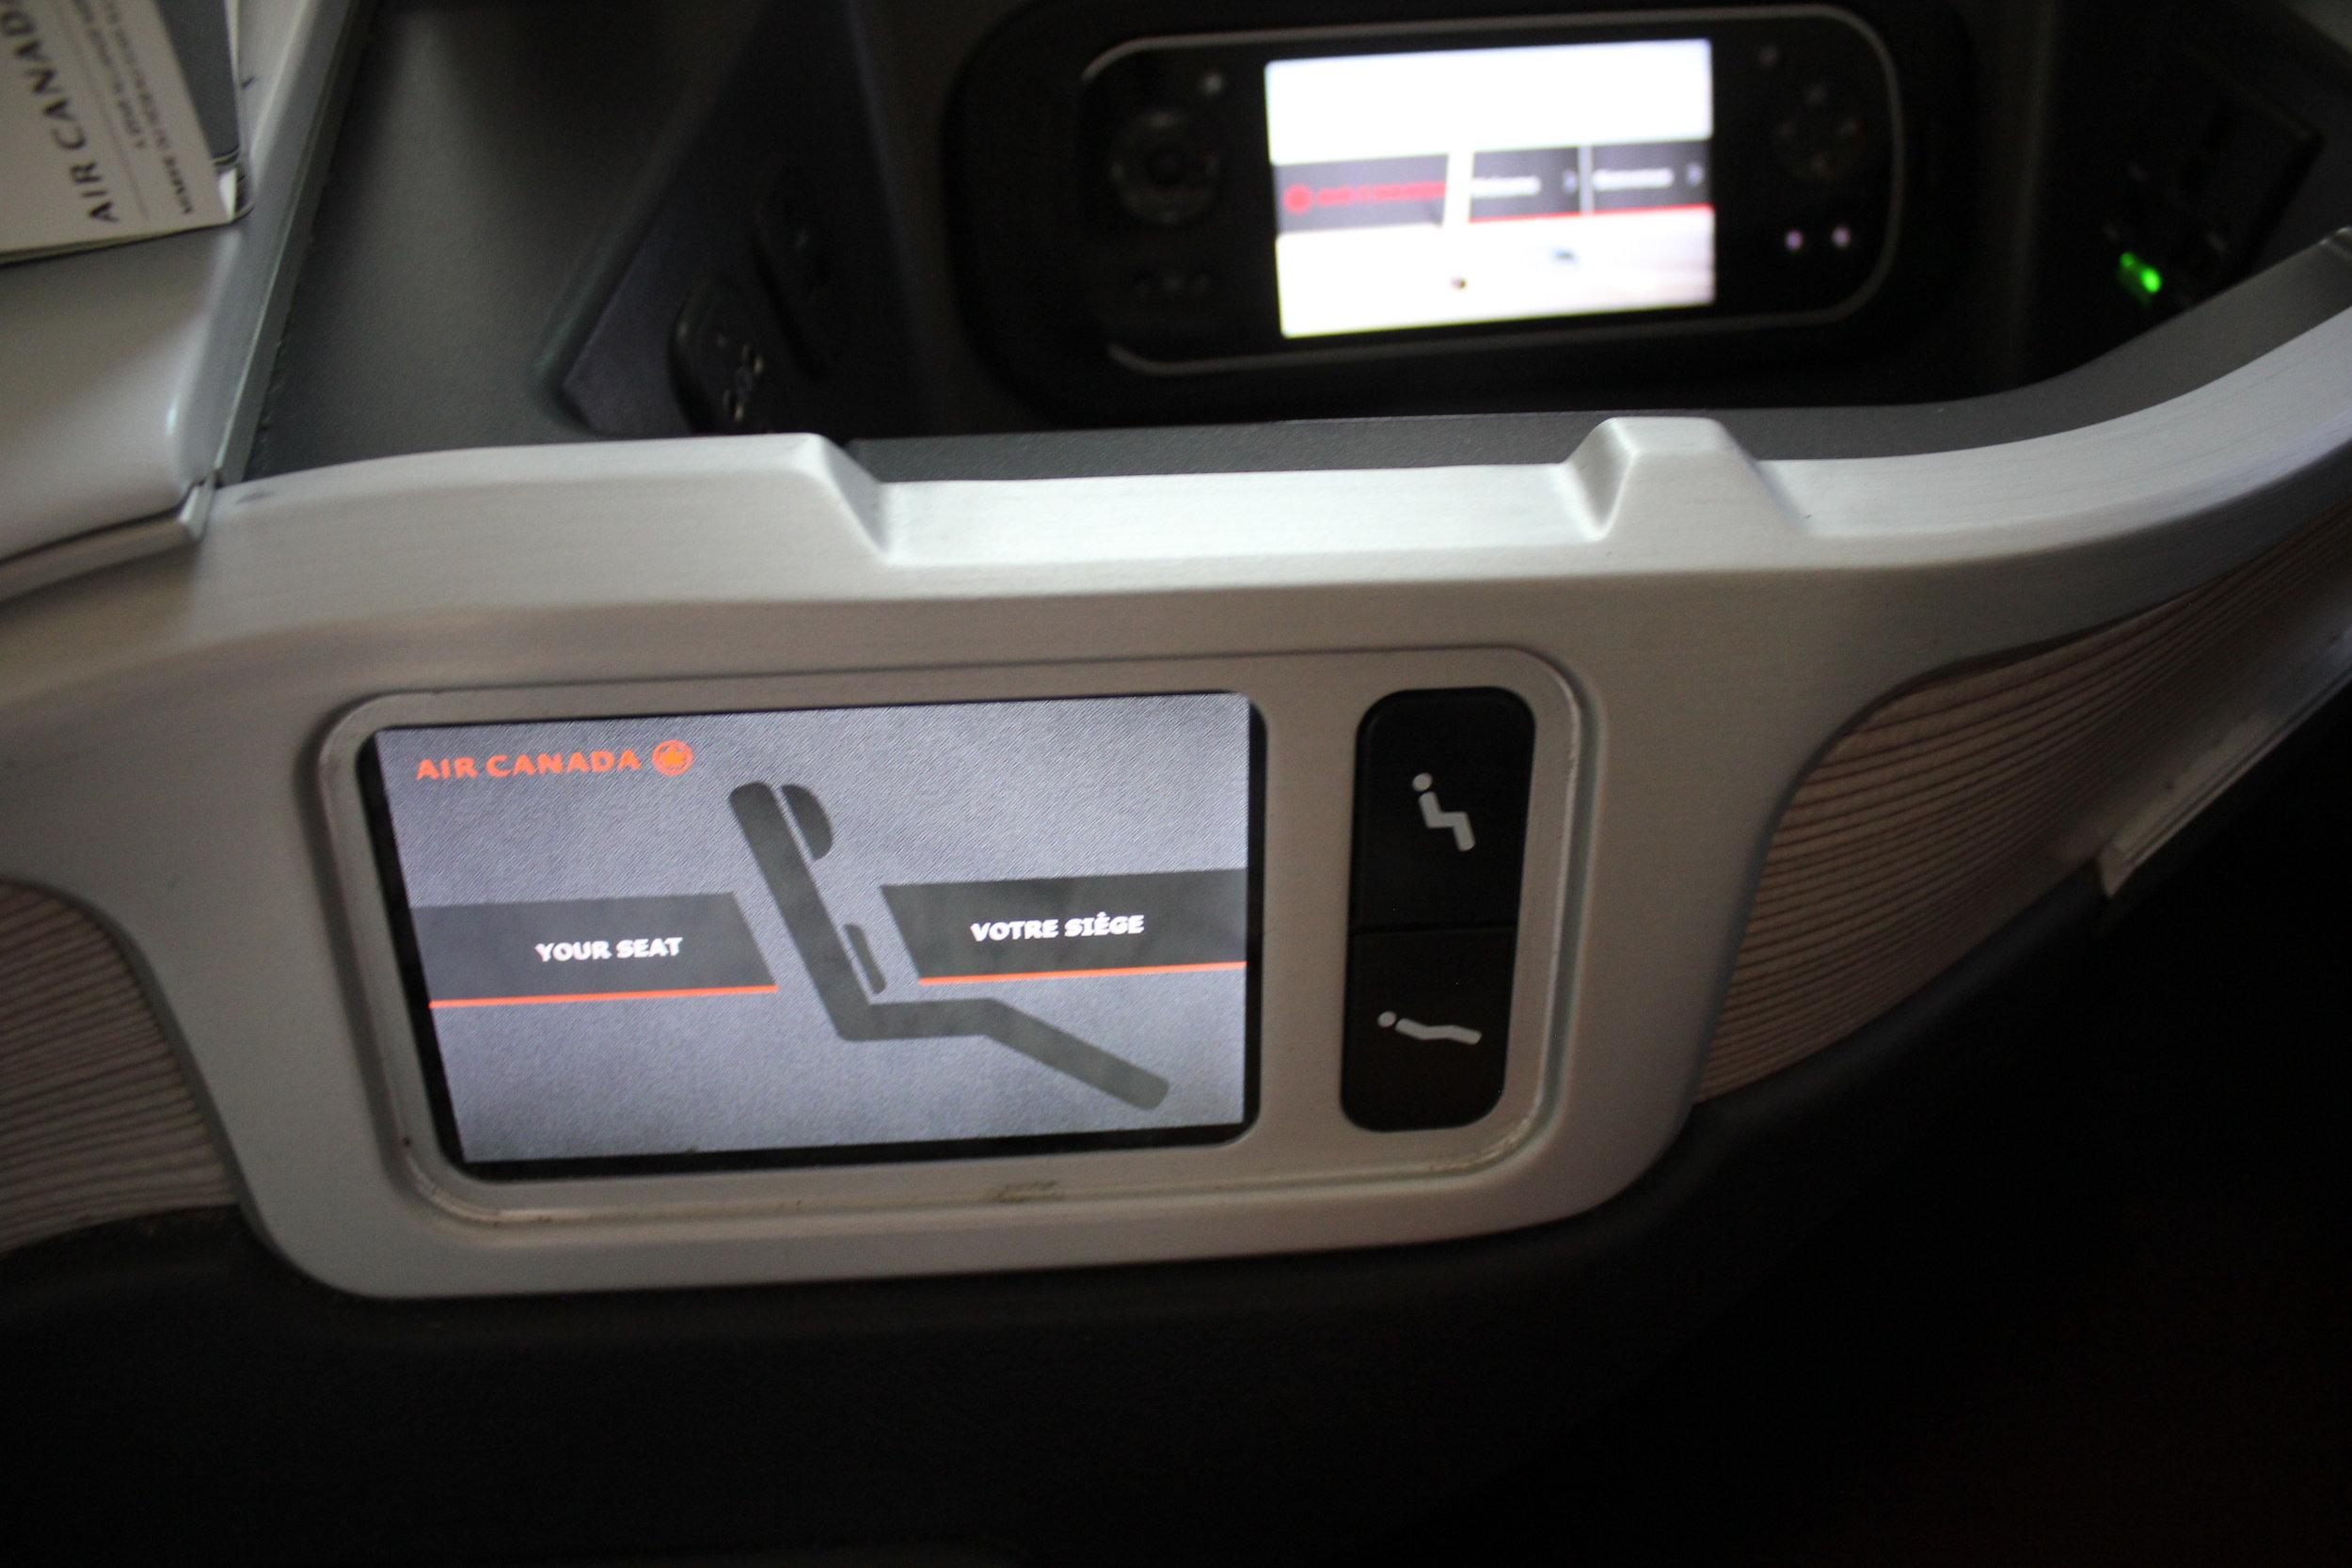 Air Canada business class – Seat controls